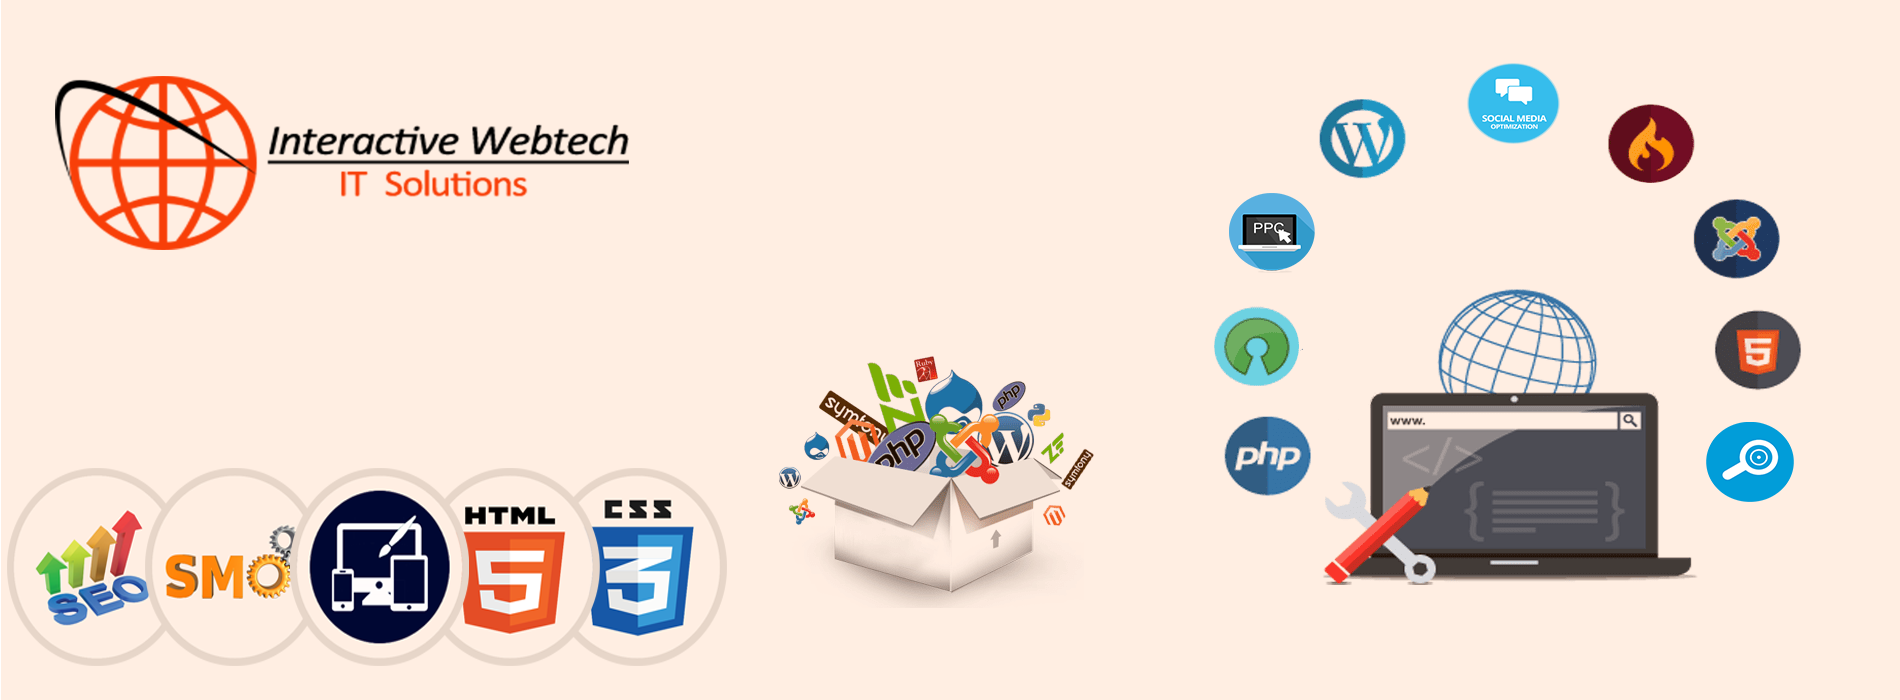 Interactivewebtech Is A Leading Web Design Amp Web Development Company We Are Goo App Development Companies Mobile App Development Companies App Development